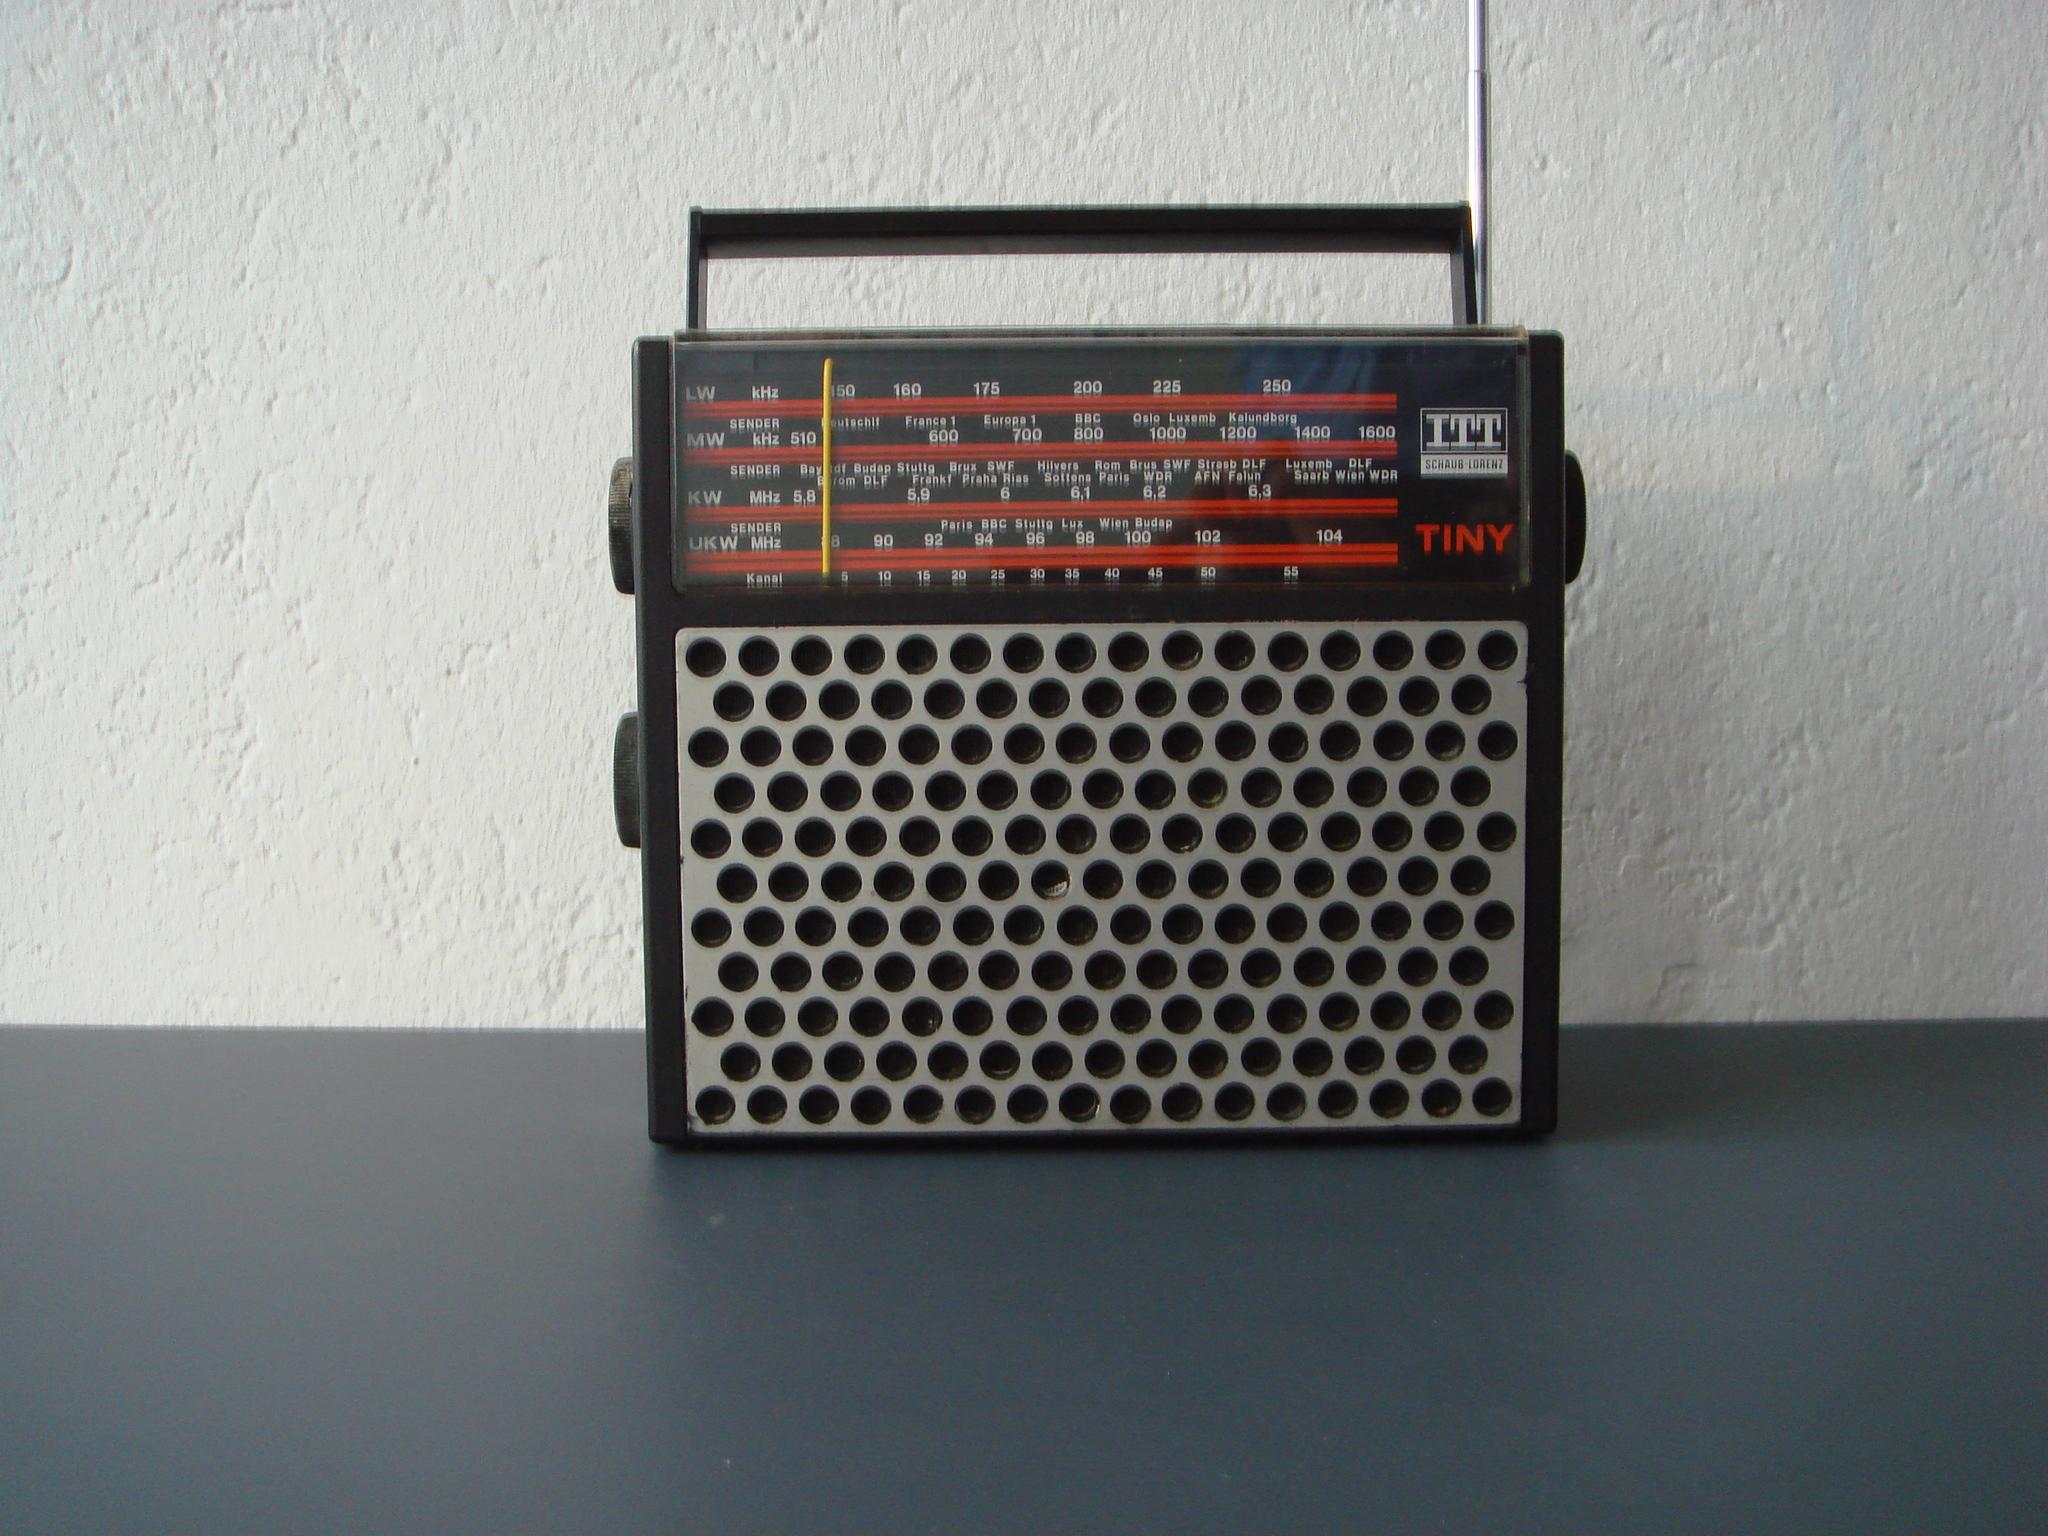 itt schaub lorenz tiny 4band radio